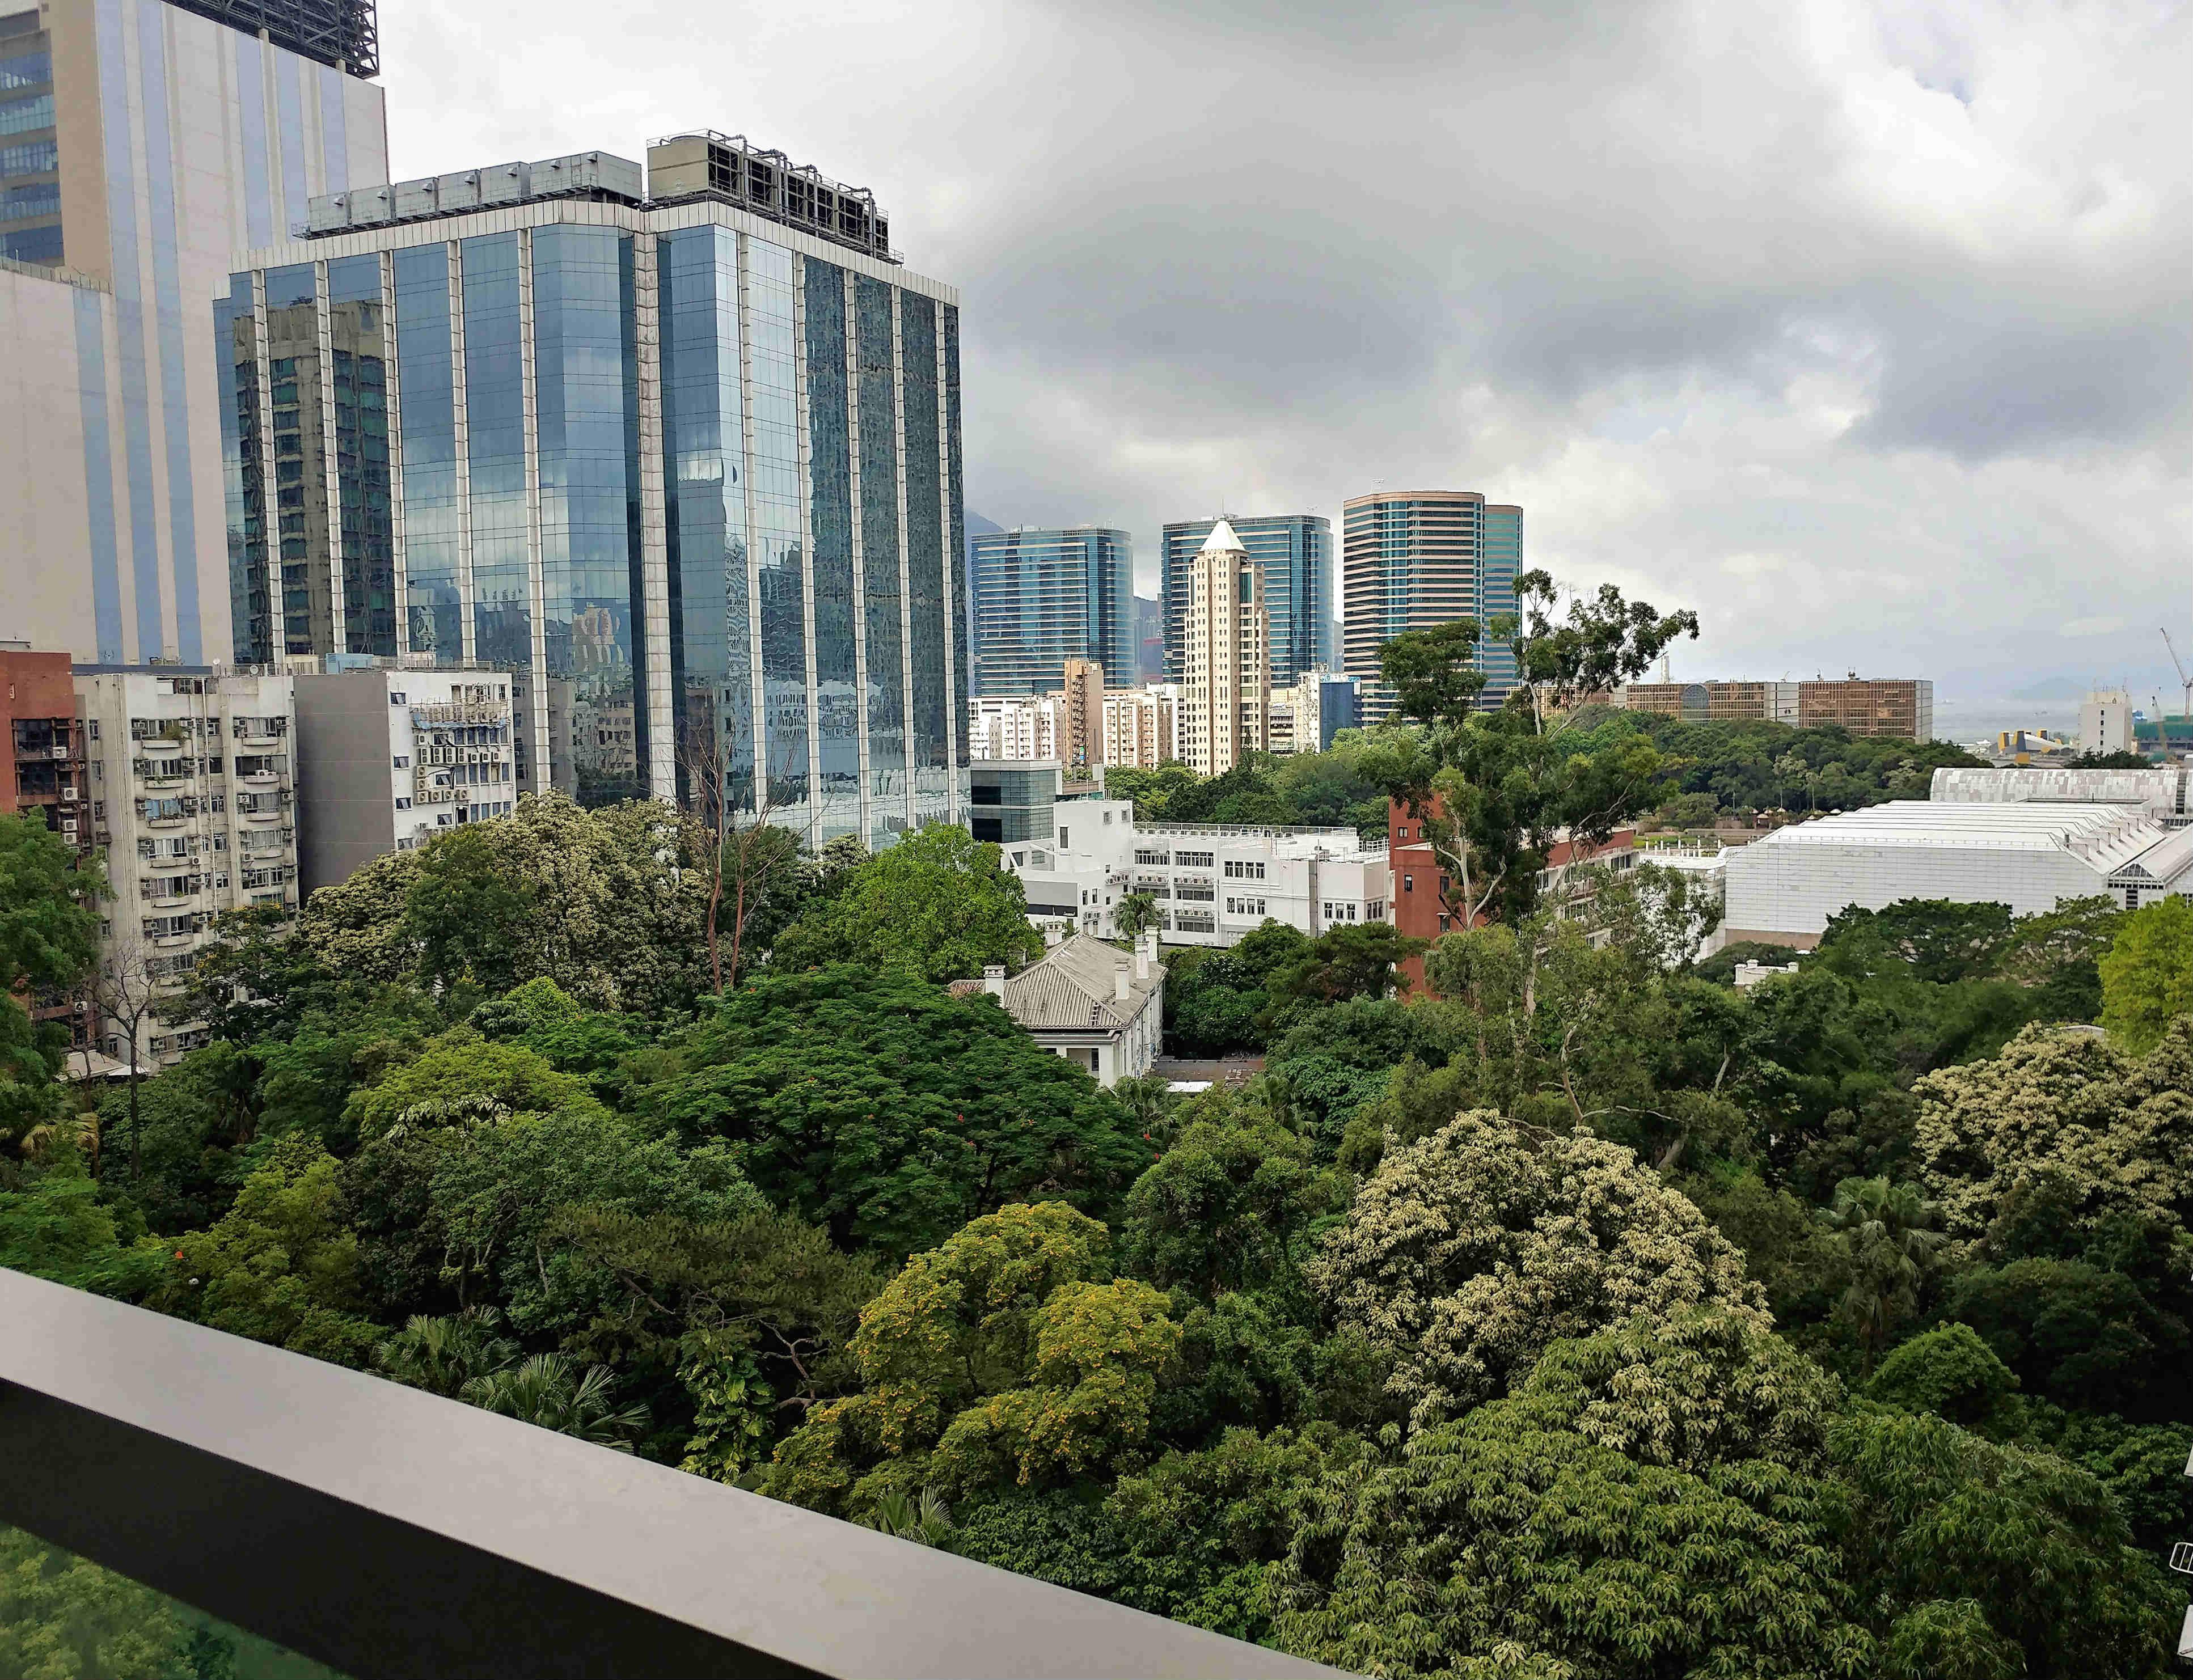 FB shop for lease overlooking greenery of Kowloon Park - Tsim Sha Tsui, Hong Kong